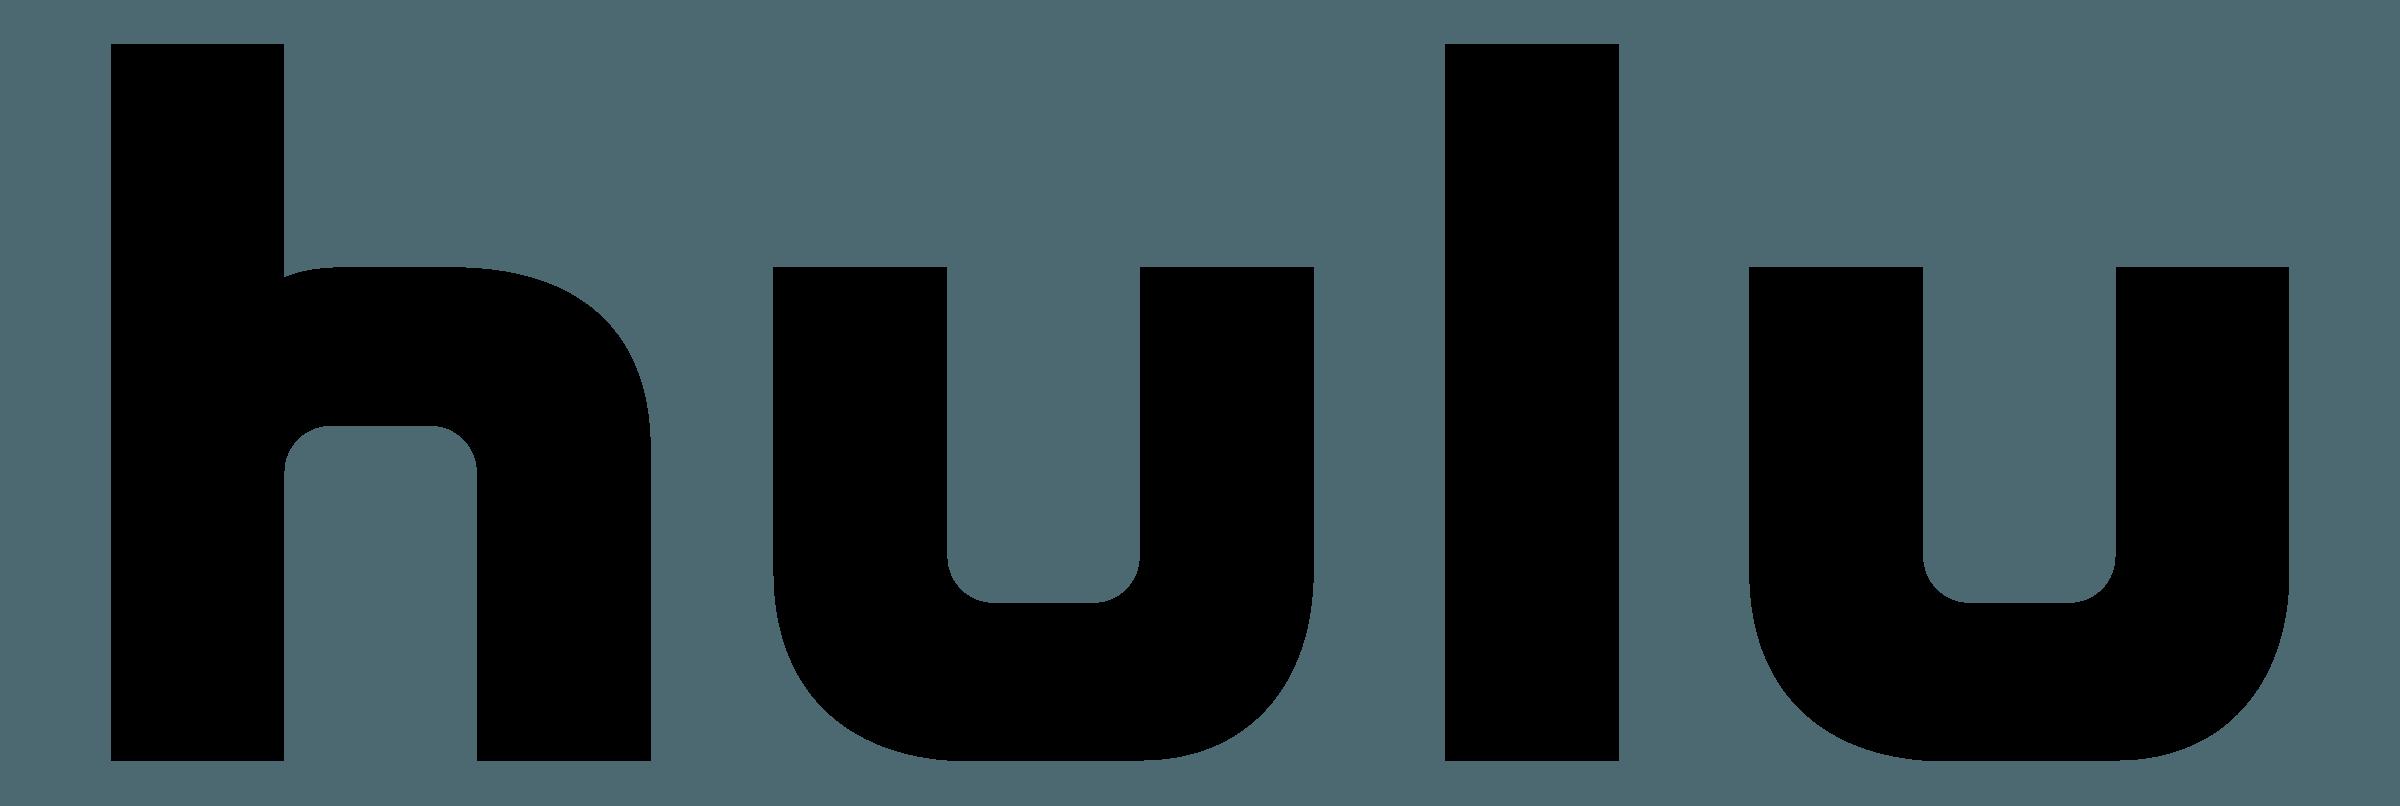 Hulu Logo Black Logos Black Company Hulu